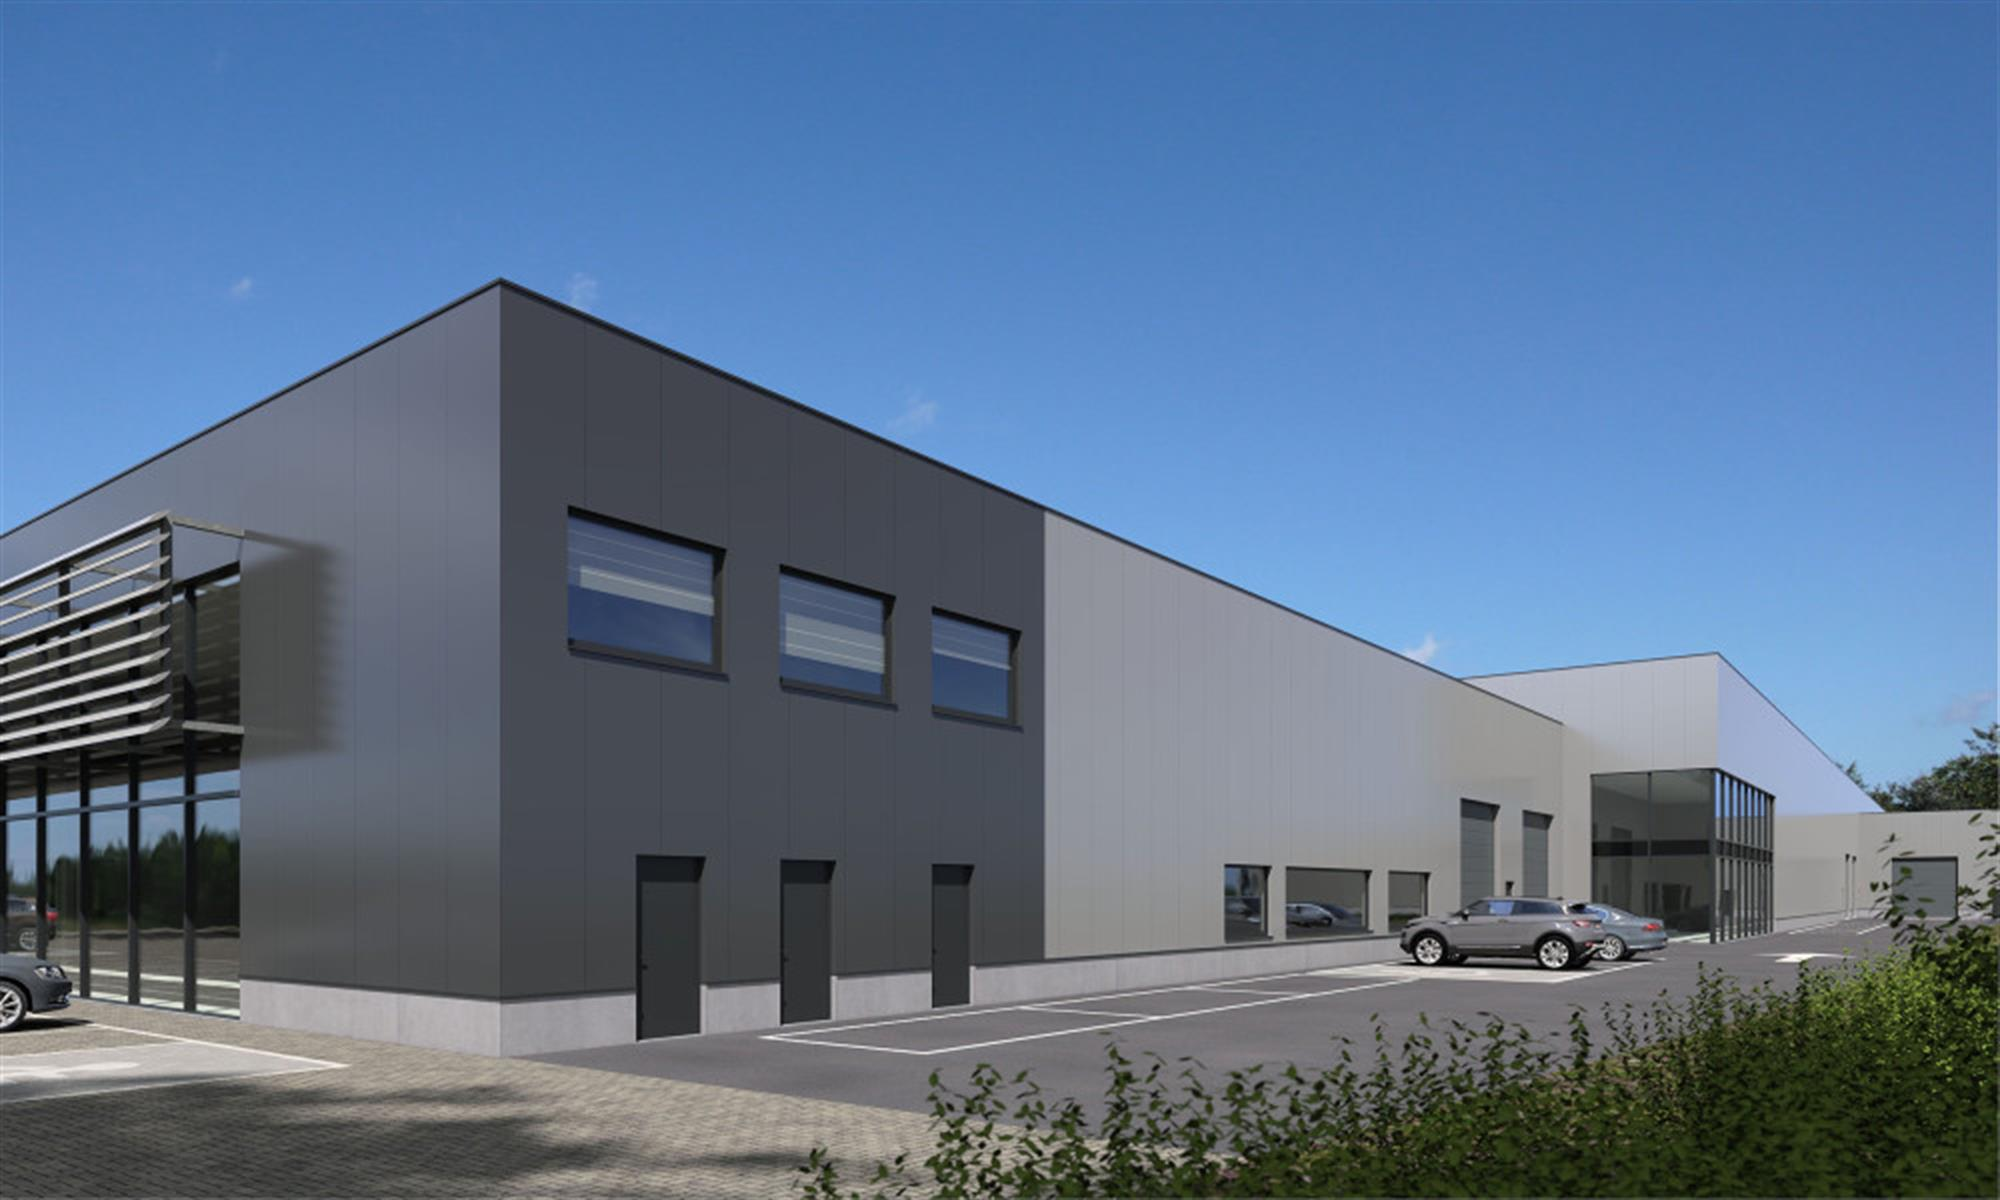 opslagplaats te huur Unit 3C - Geelseweg 7, 2200 Herentals, België 2